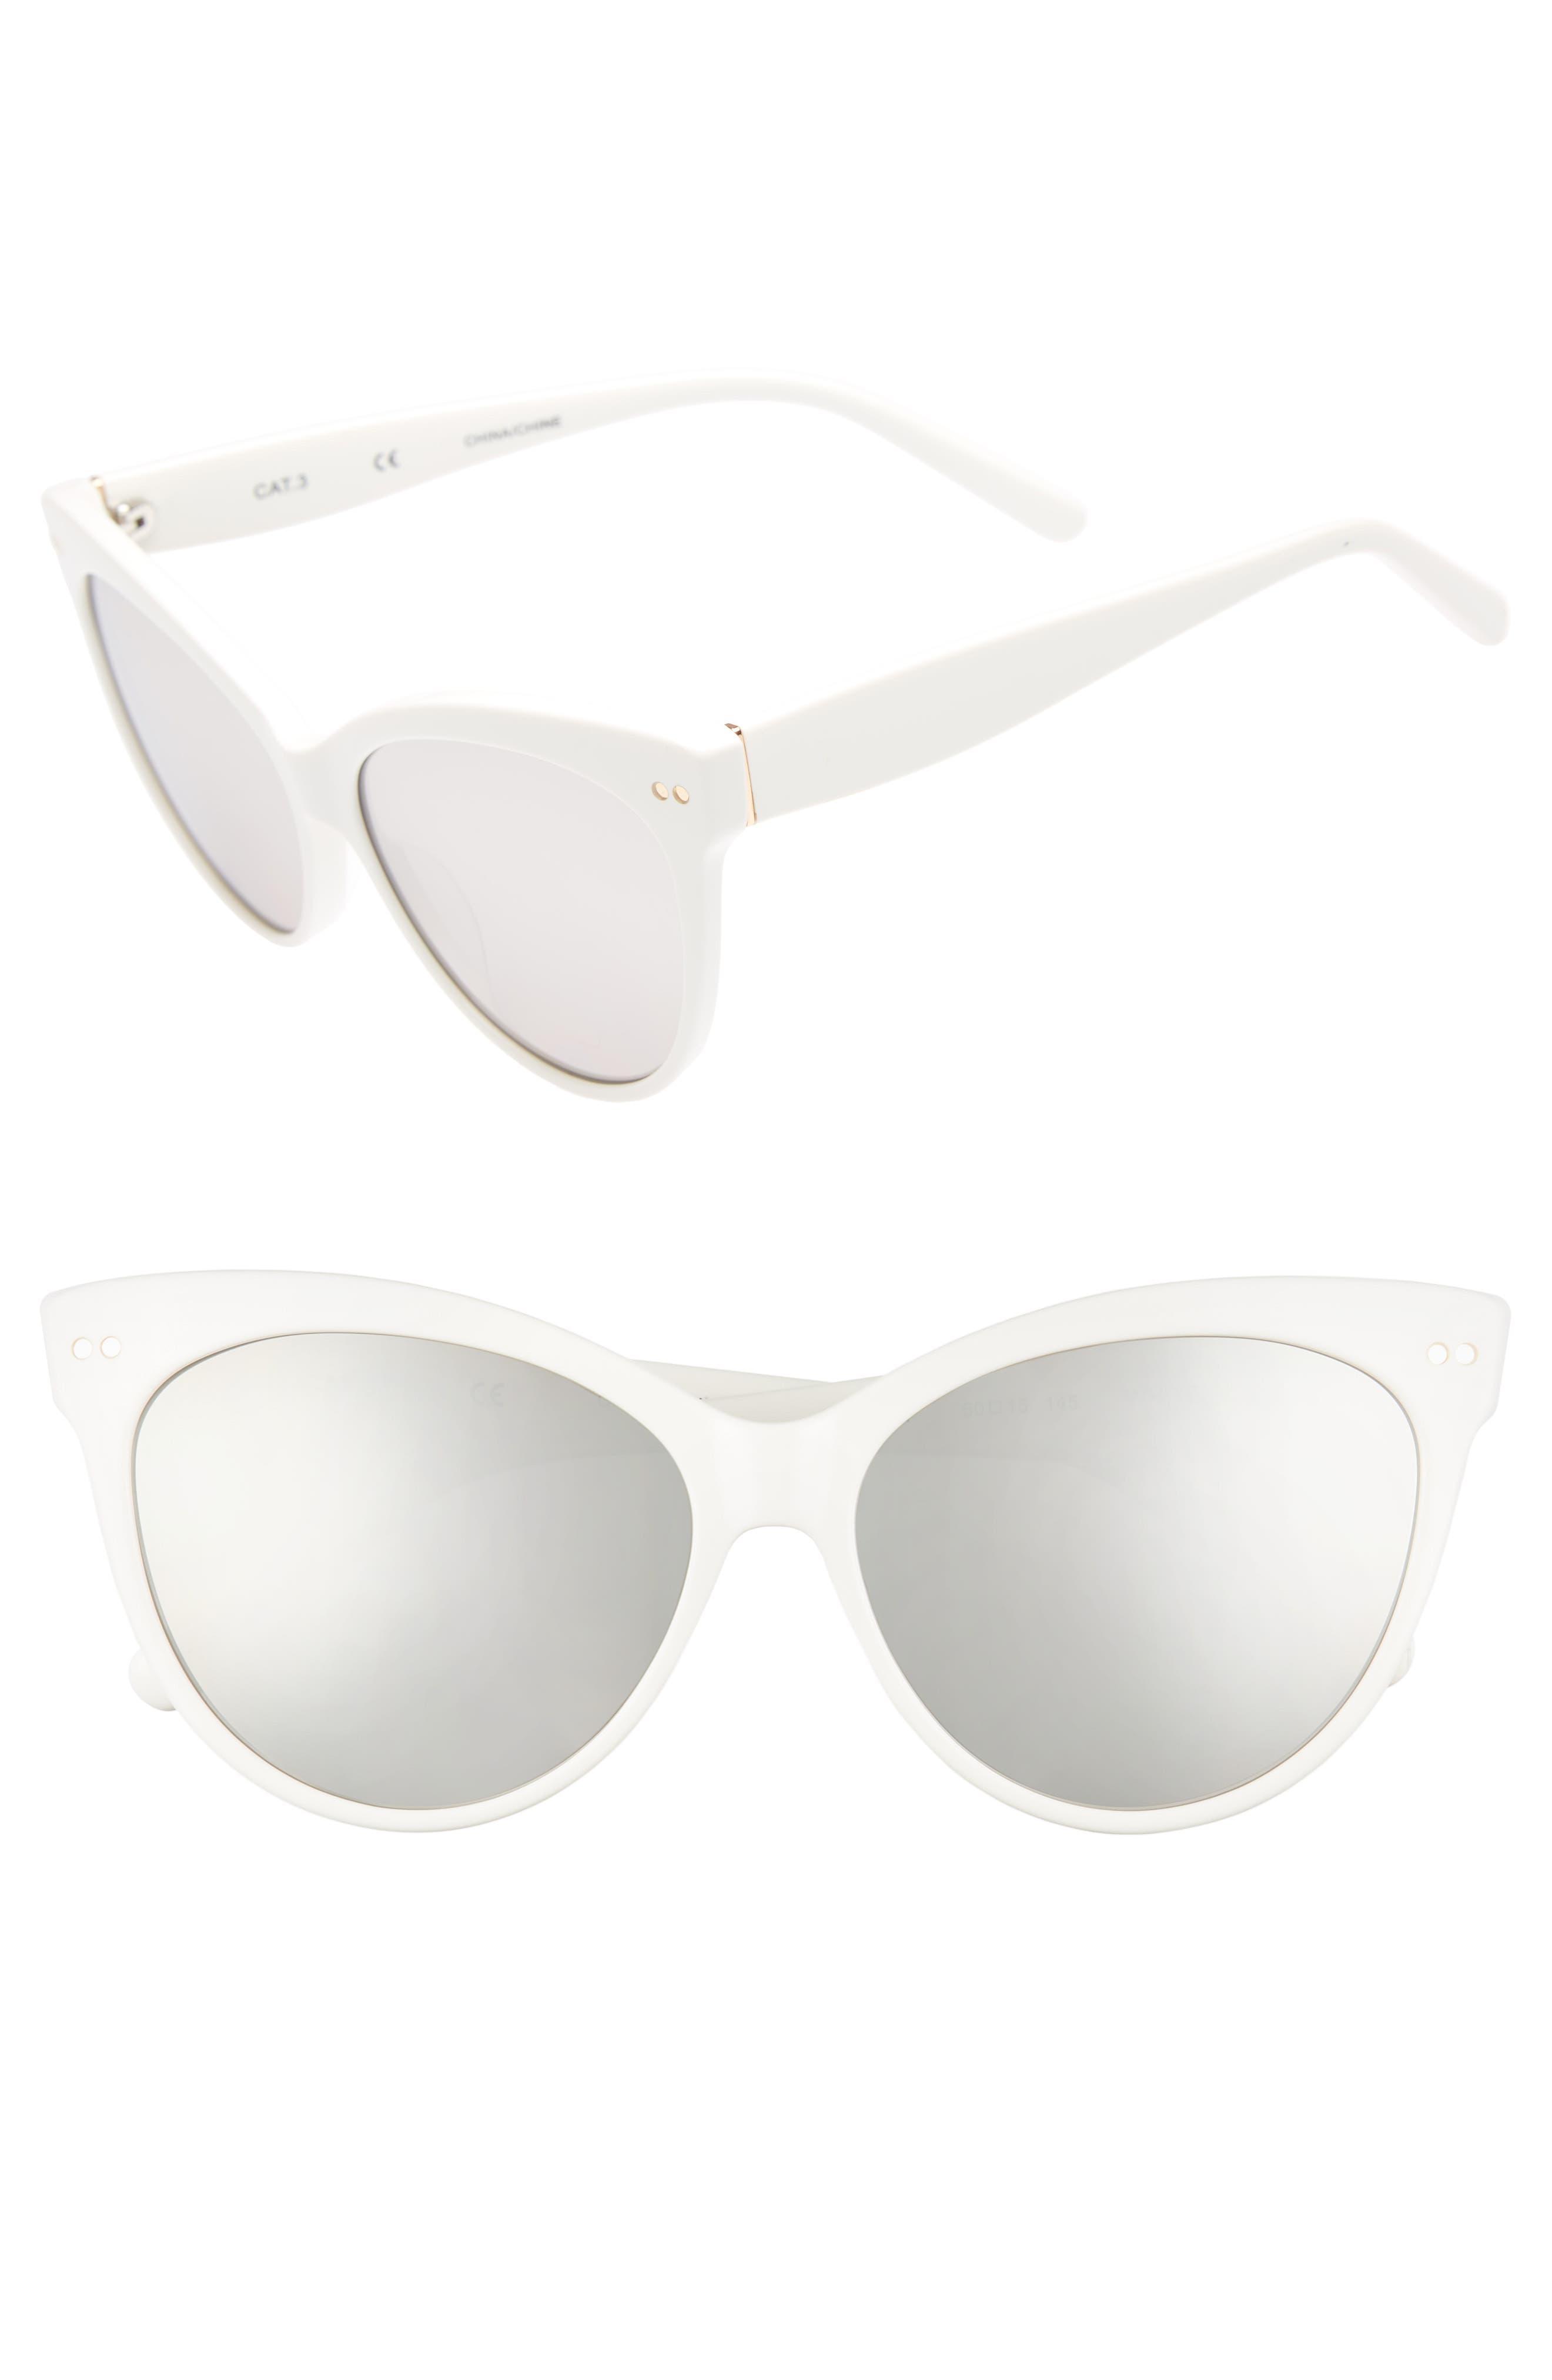 Audrey 60mm Cat Eye Sunglasses,                         Main,                         color, WHITE